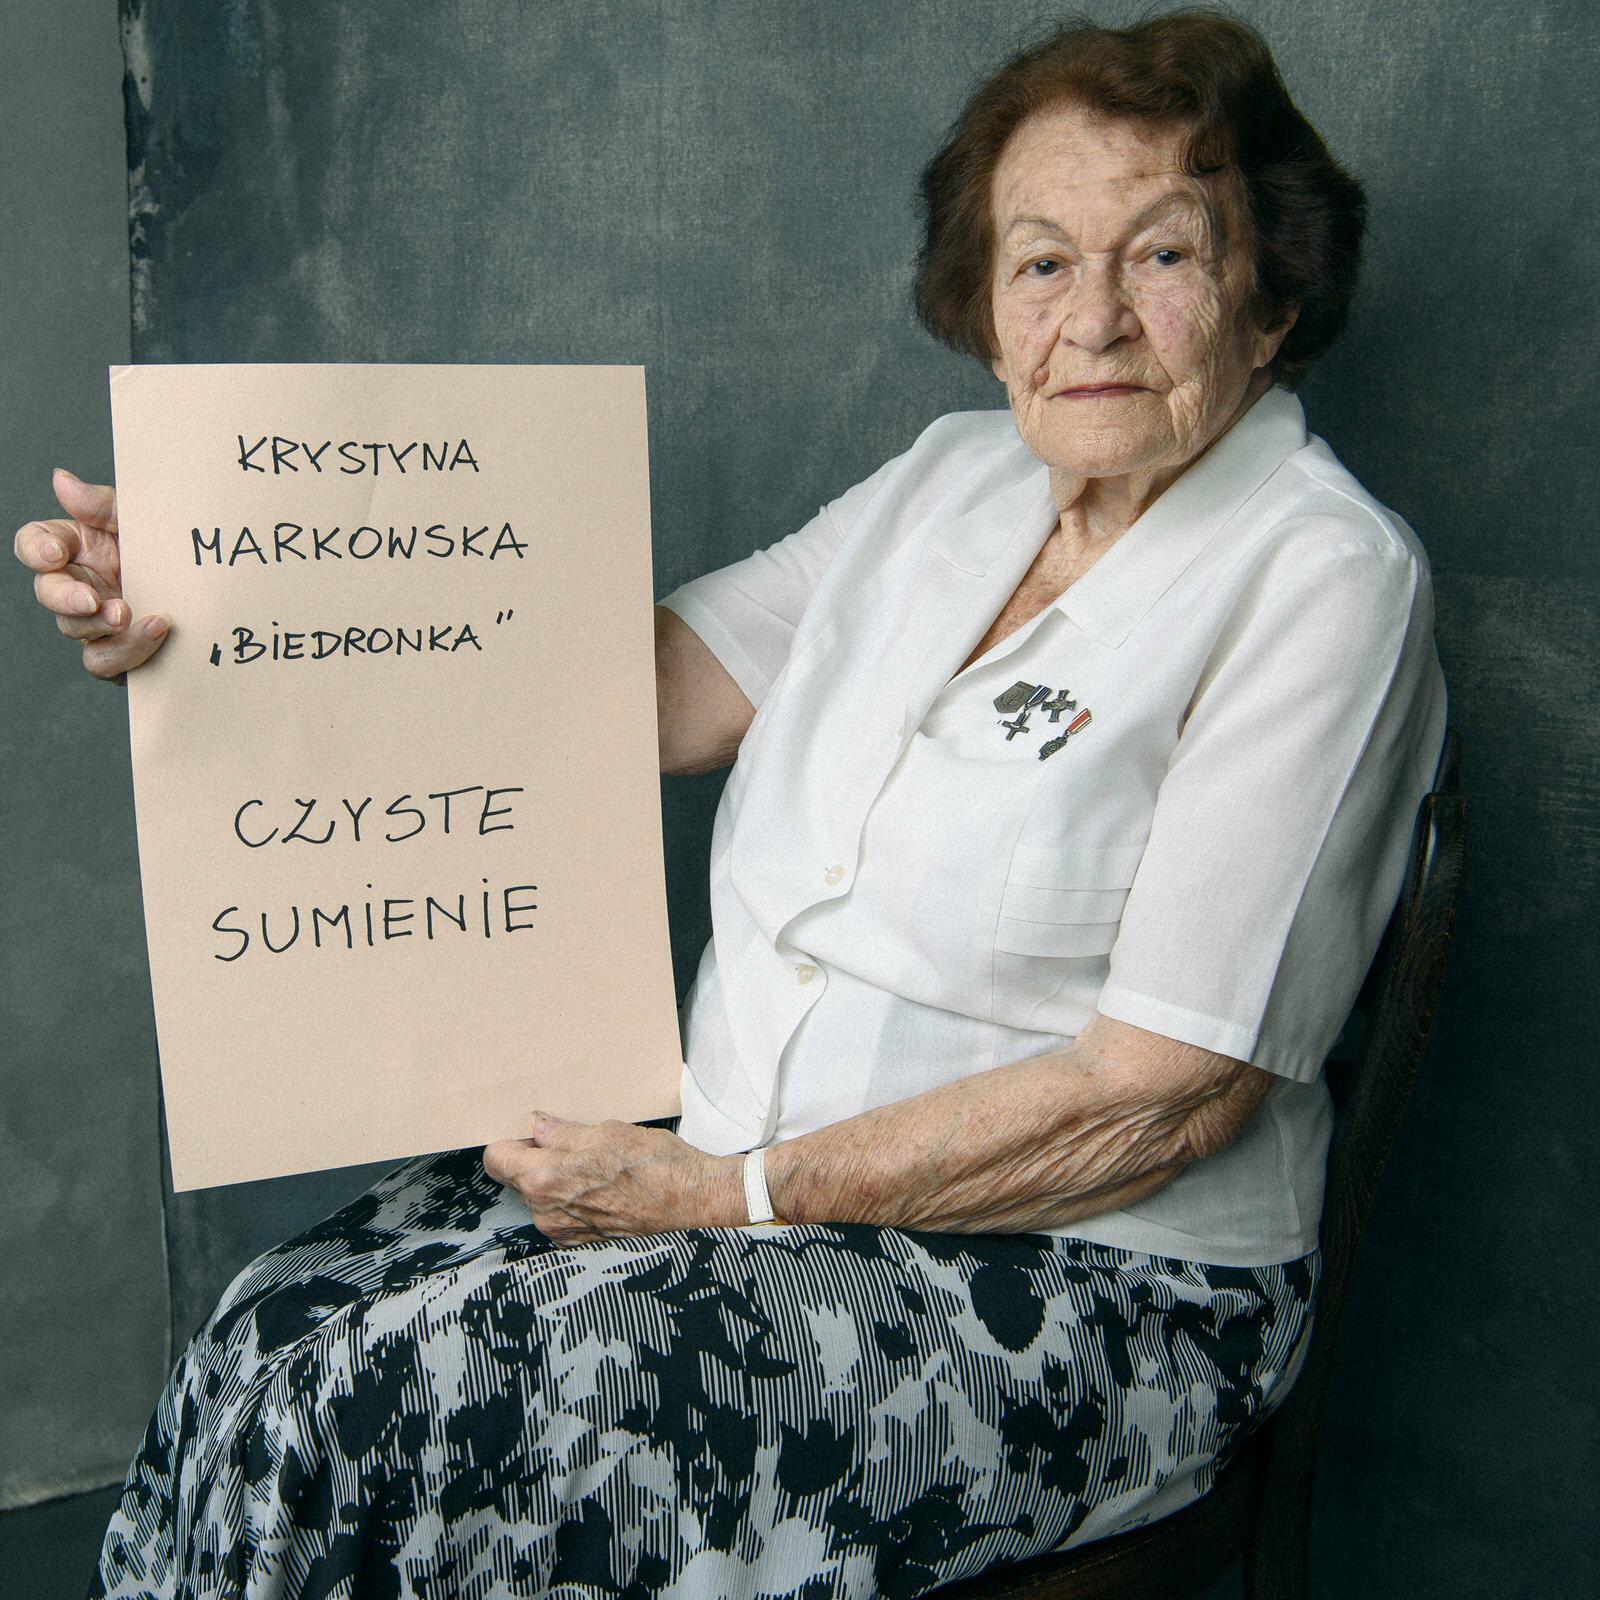 Krystyna-Markowska